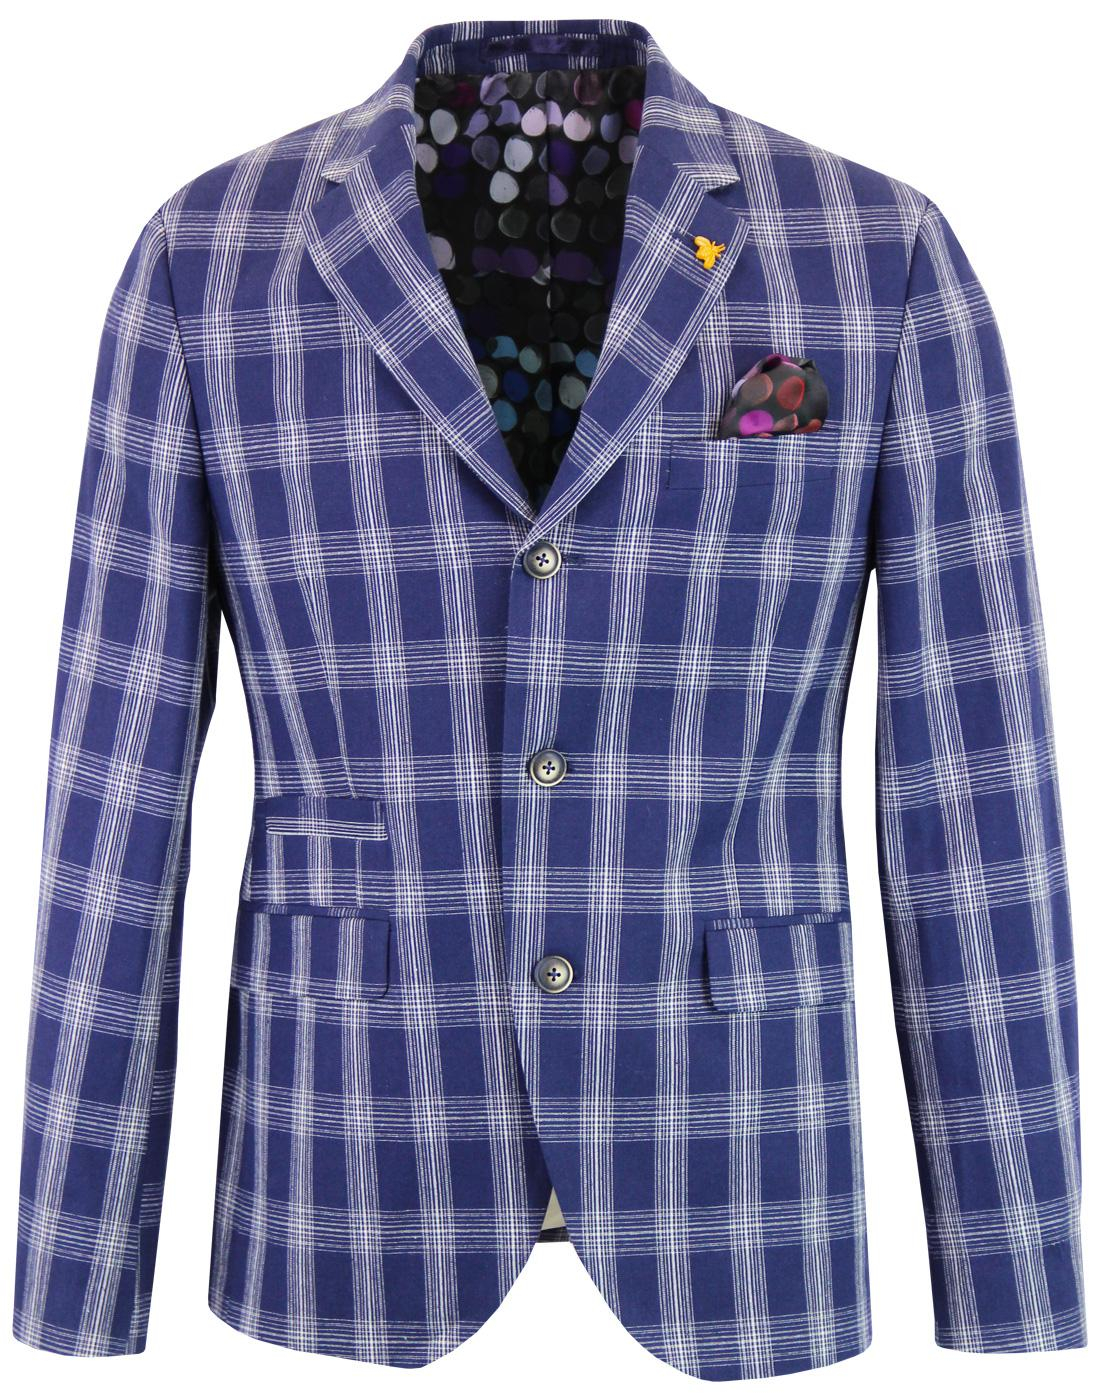 Moorgate GIBSON LONDON Check Ivy League Blazer